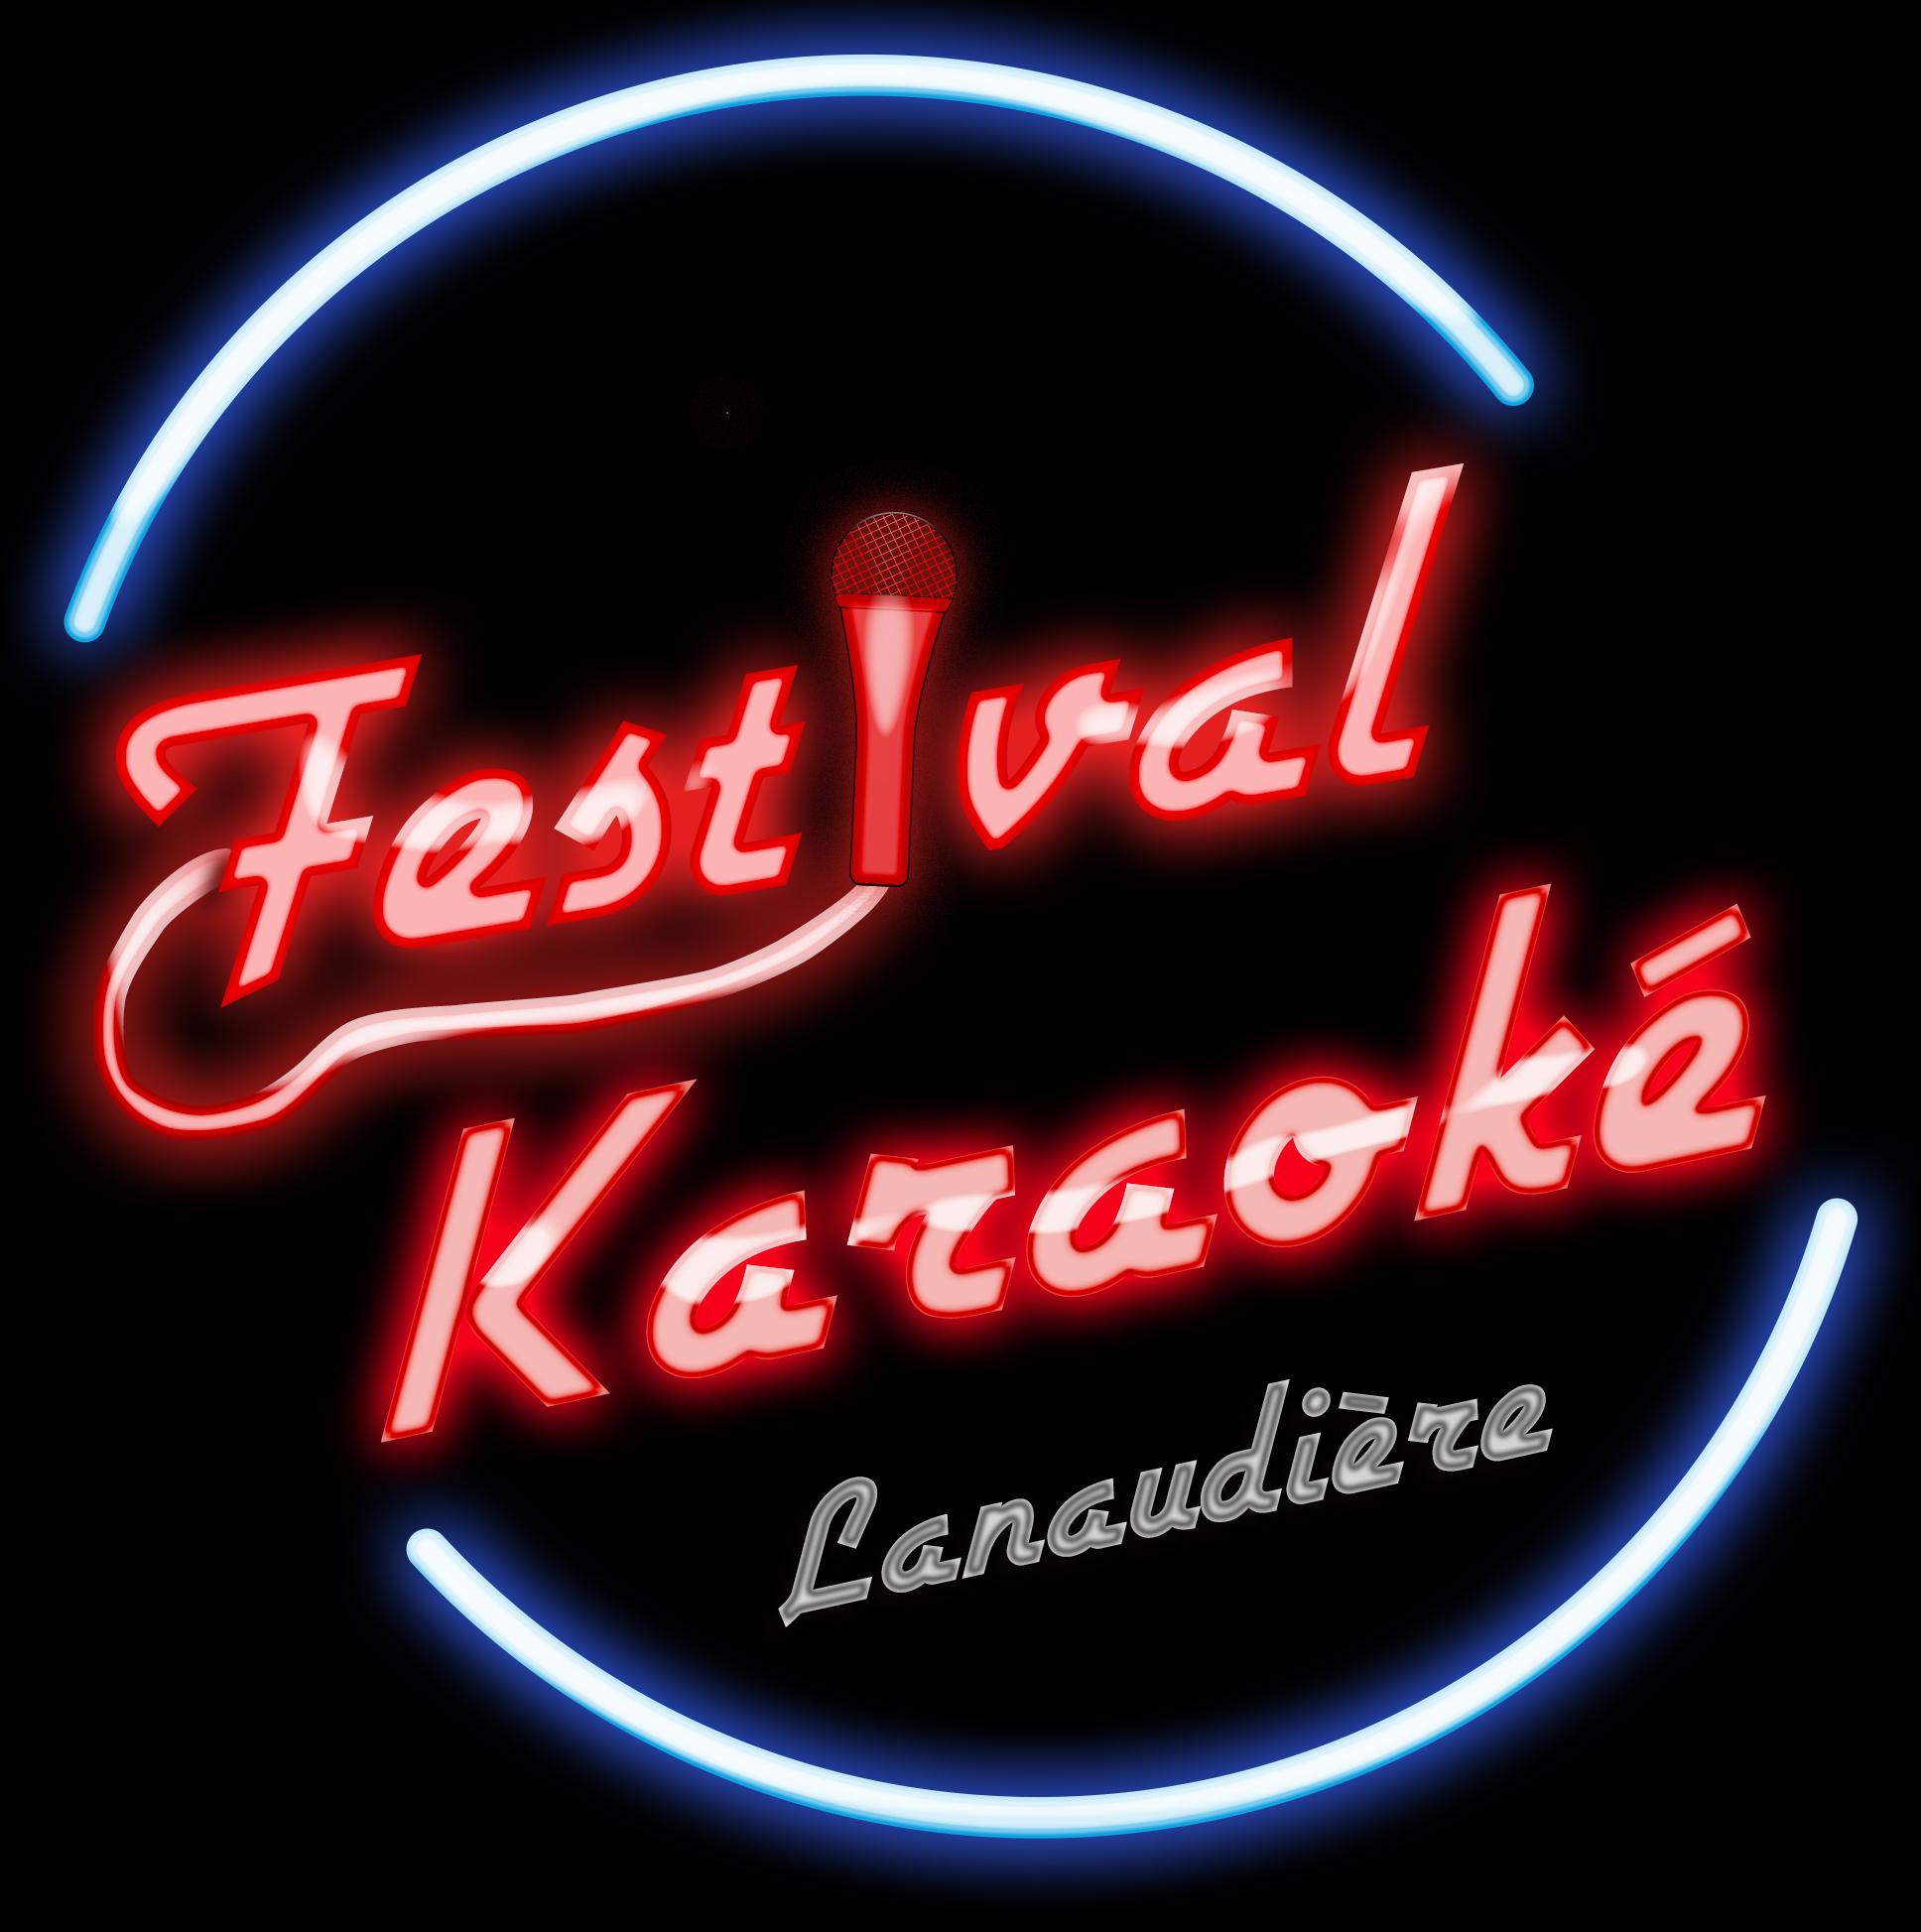 Festival Karaoké Lanaudière